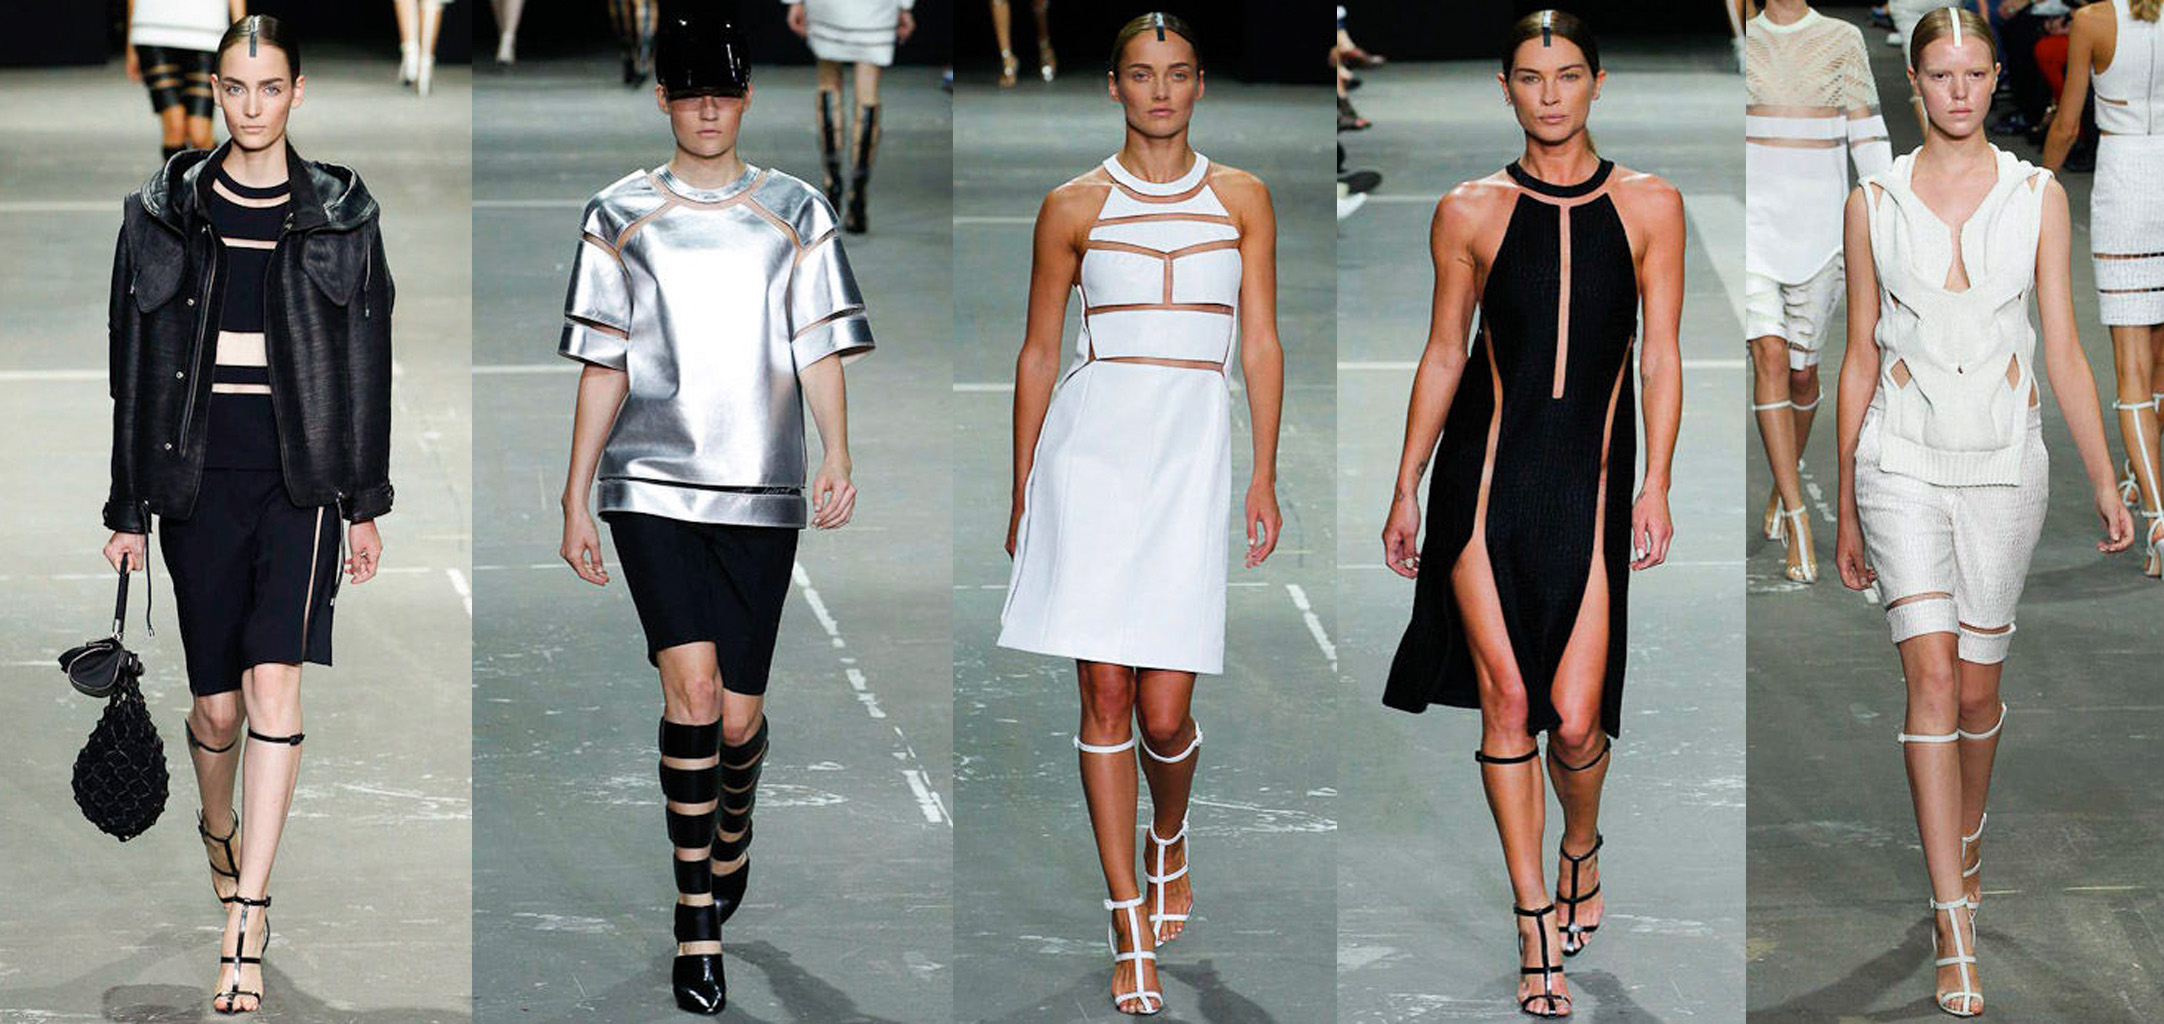 Fashion Design Summer Programs In California